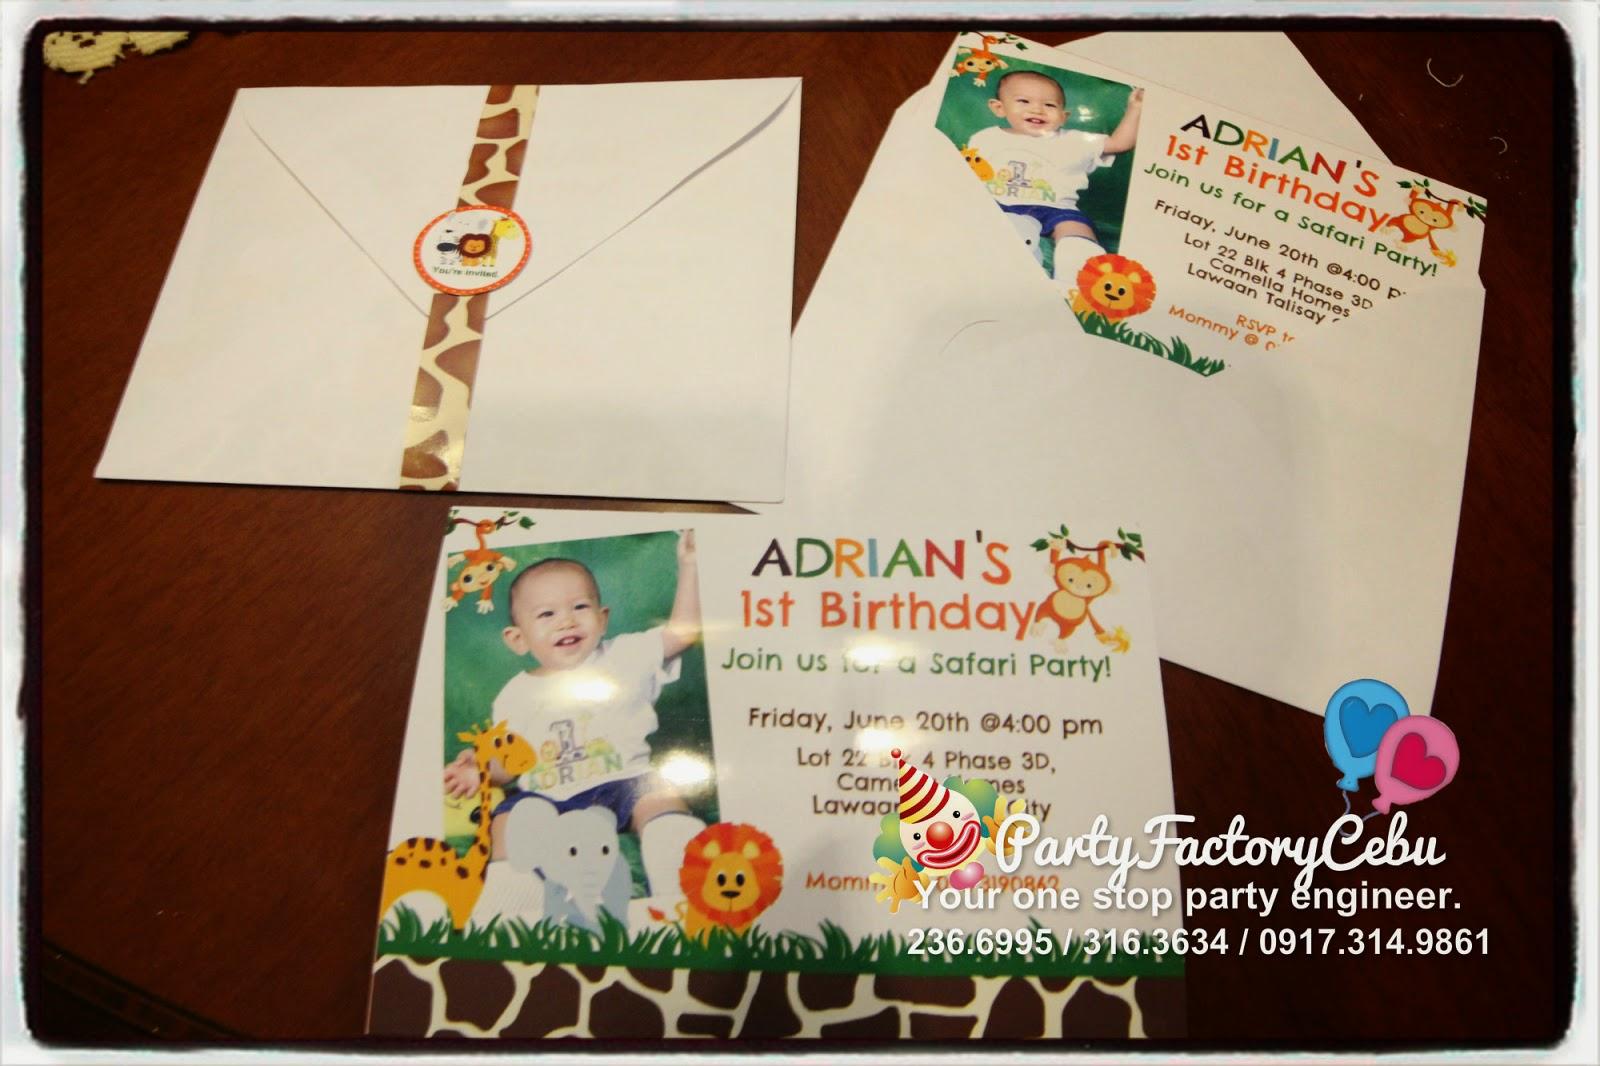 Welcome to PartyFactory Cebu: Adrian Josh\'s 1st safari Birthday party